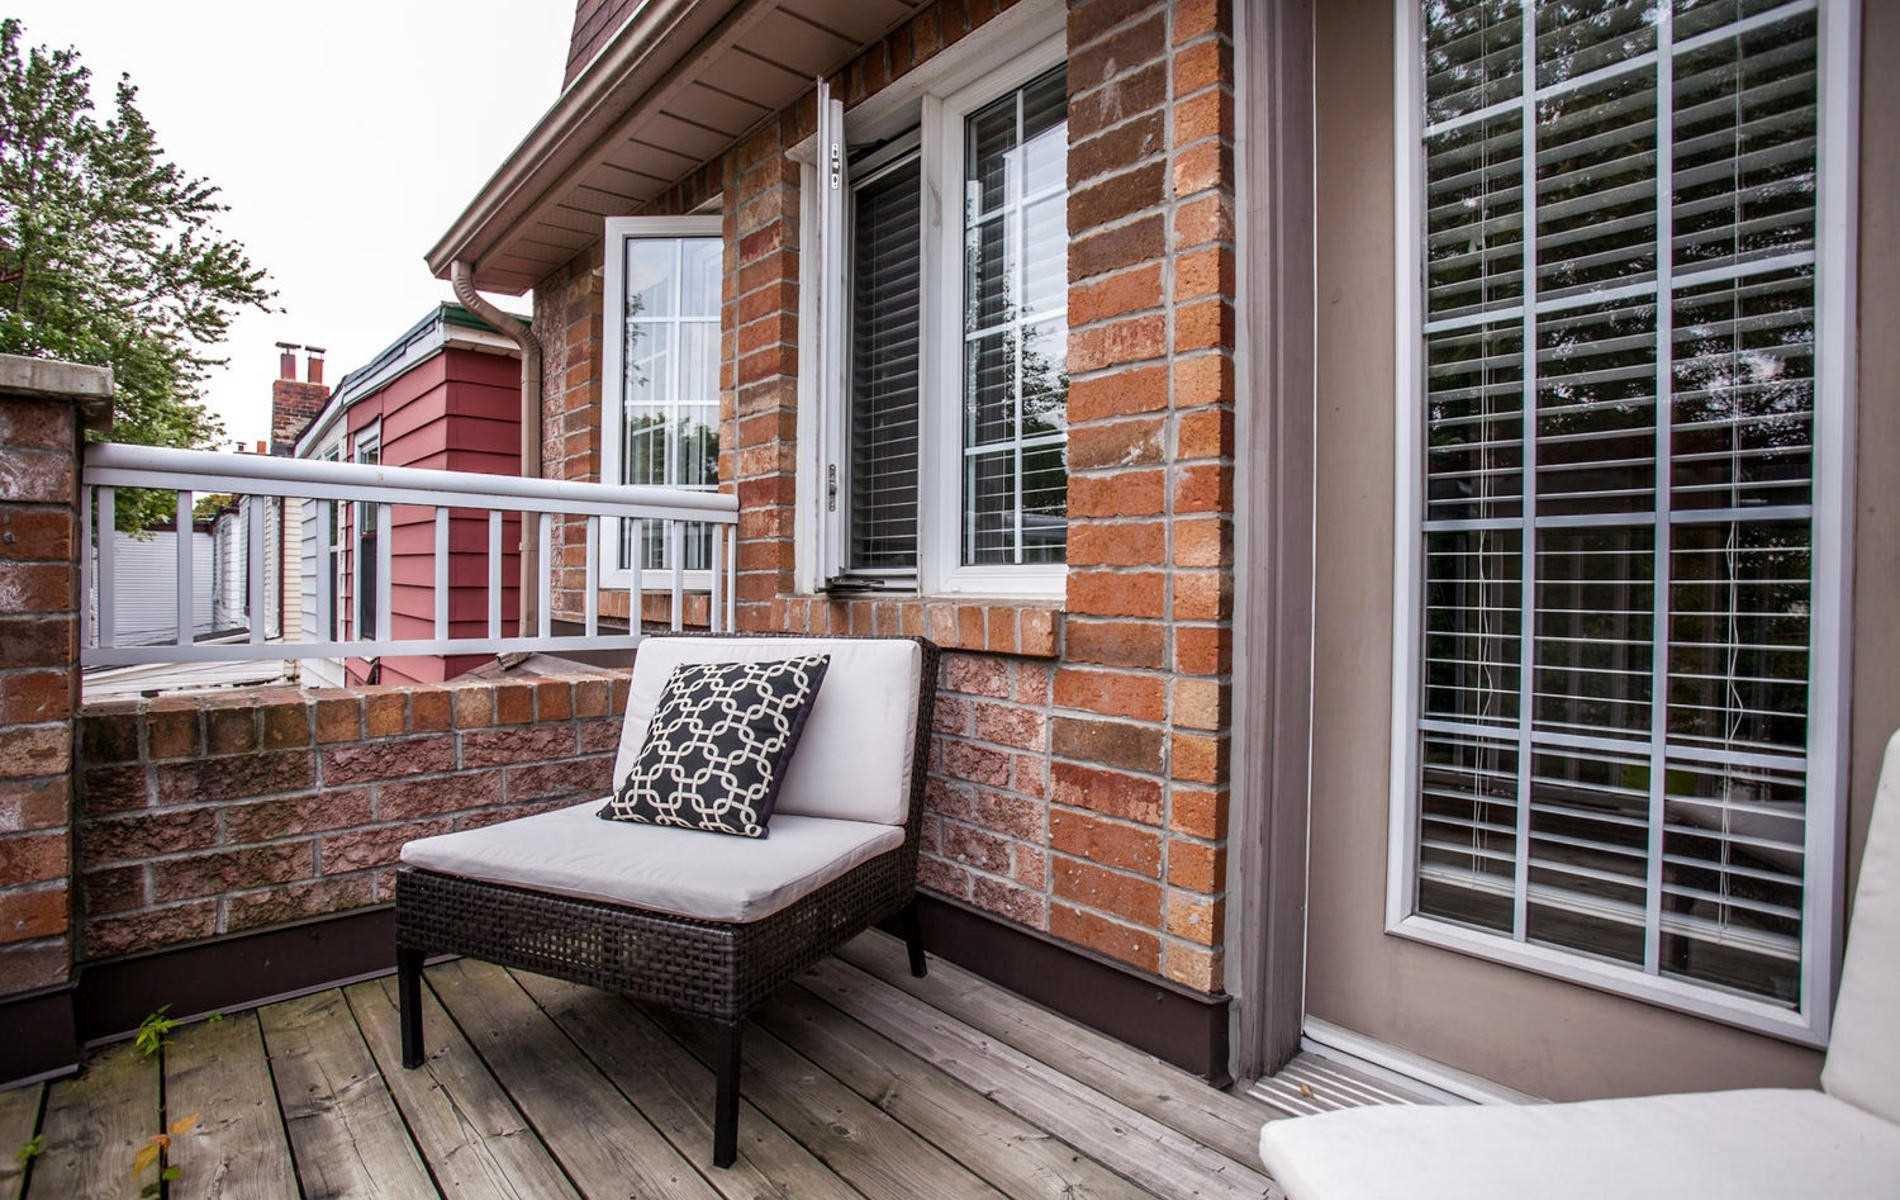 Photo 11: Photos: 119 Carlaw Avenue in Toronto: South Riverdale House (3-Storey) for lease (Toronto E01)  : MLS®# E4386176